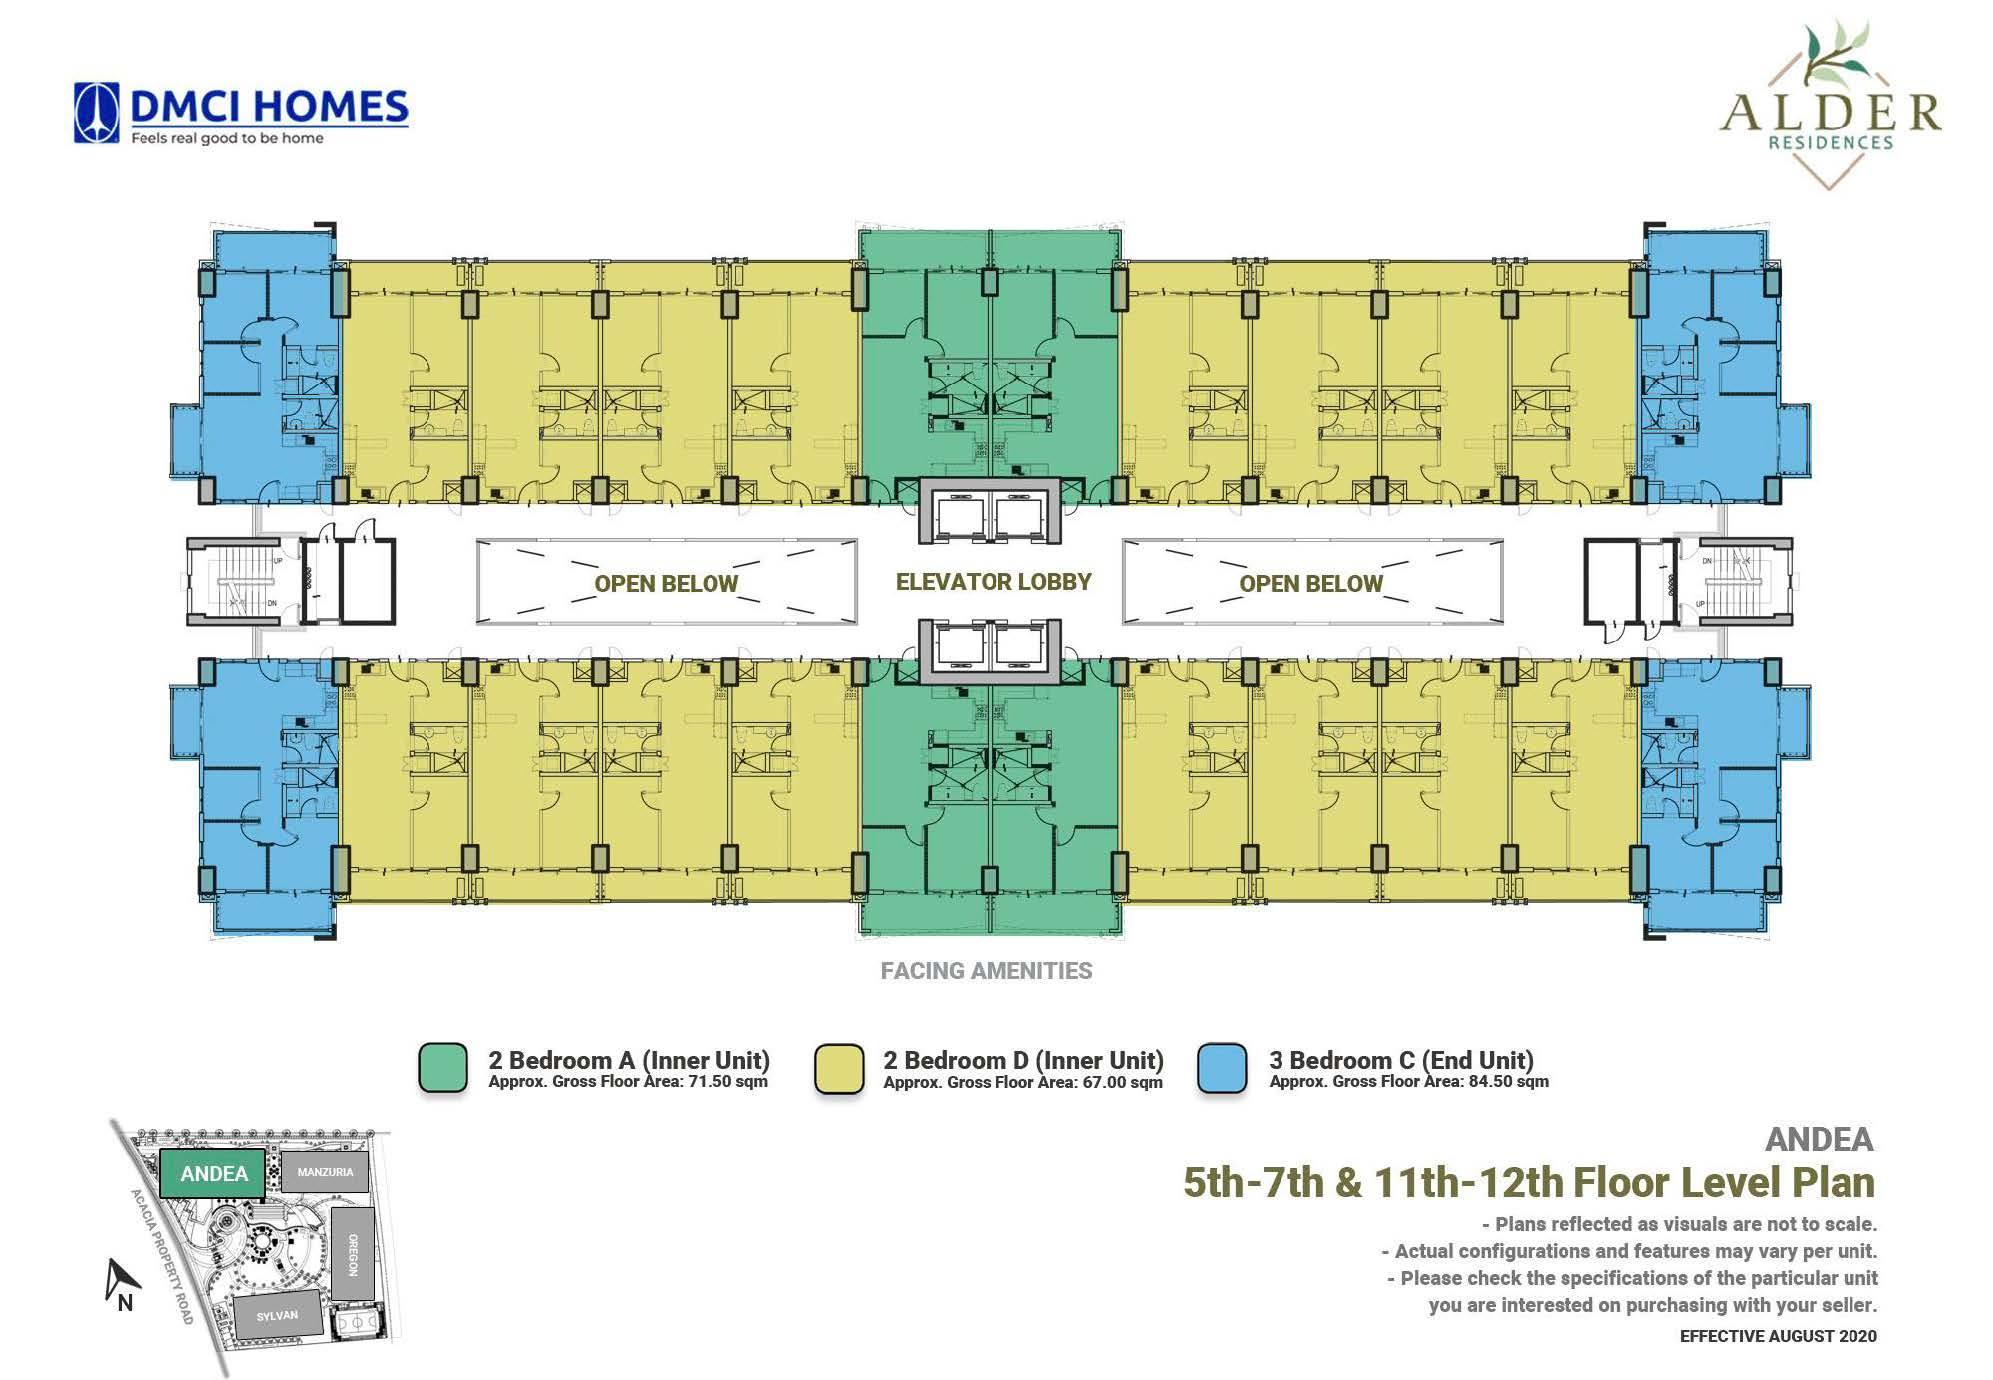 5th - 7th & 11th - 12th Level Floor Plan